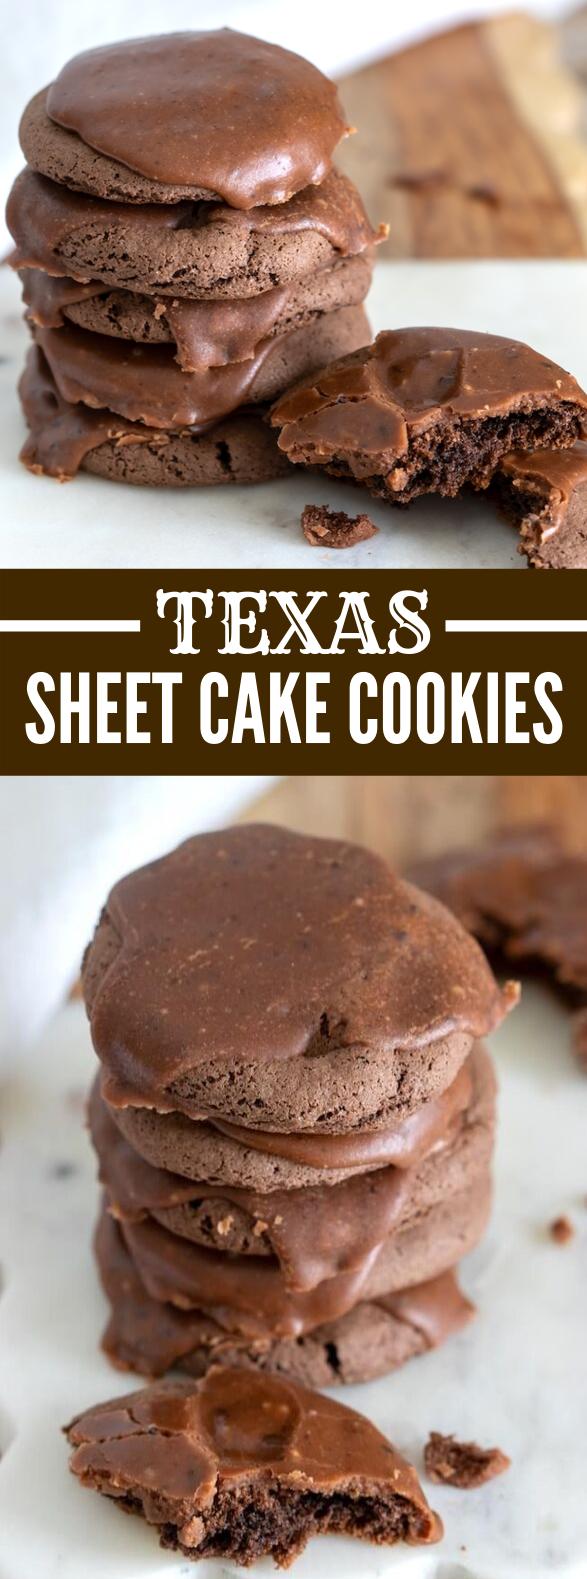 Texas Sheet Cake Cookies (Chocolate Cake Mix Cookies w/ Fudge Icing) #desserts #classic